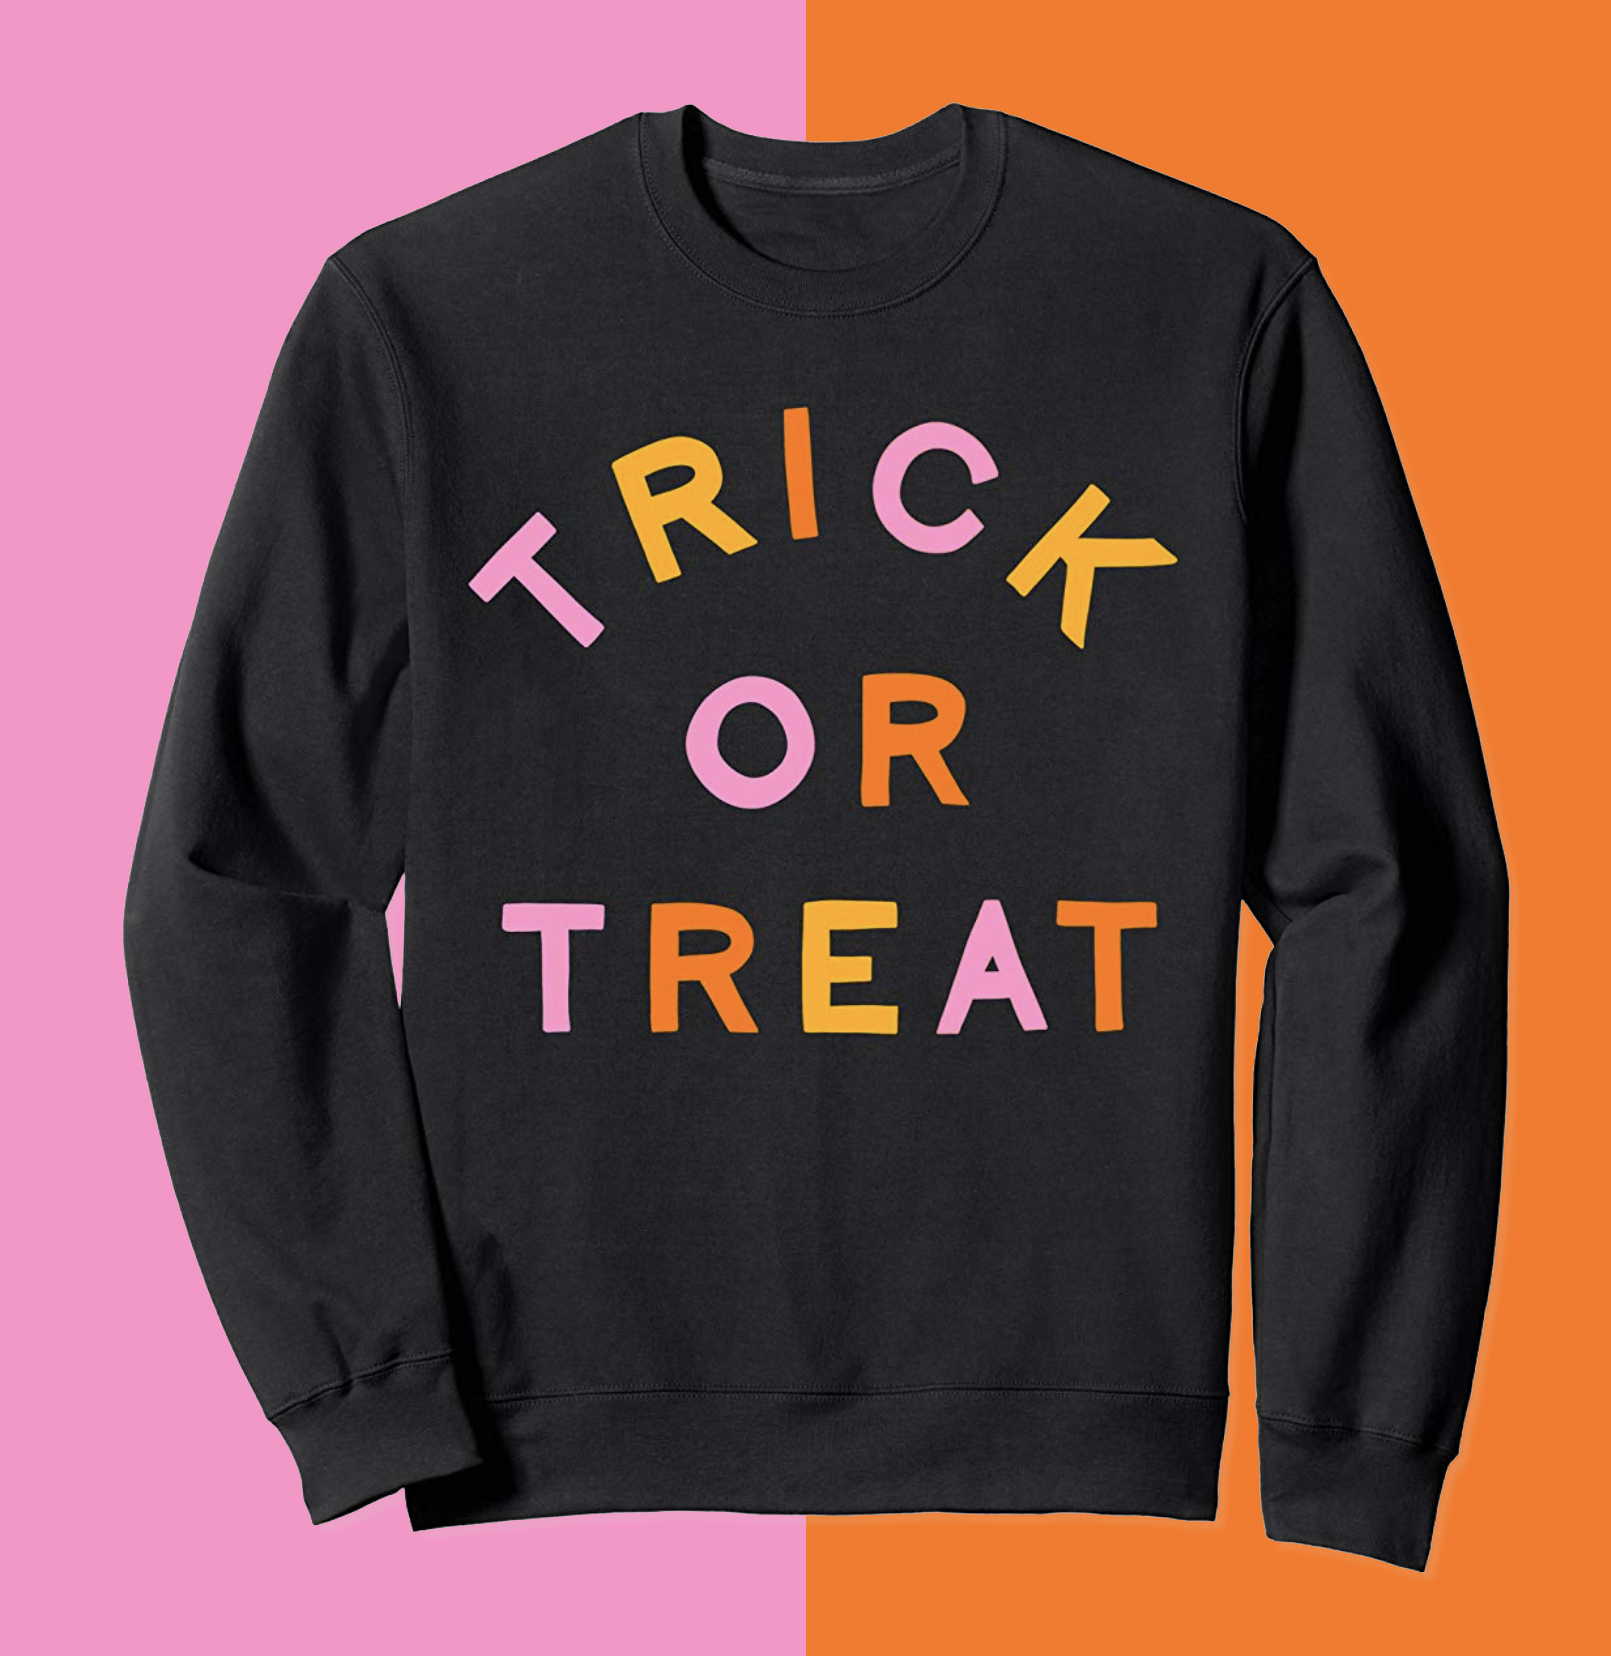 TRICK OR TREAT CREWNECK  $33.00